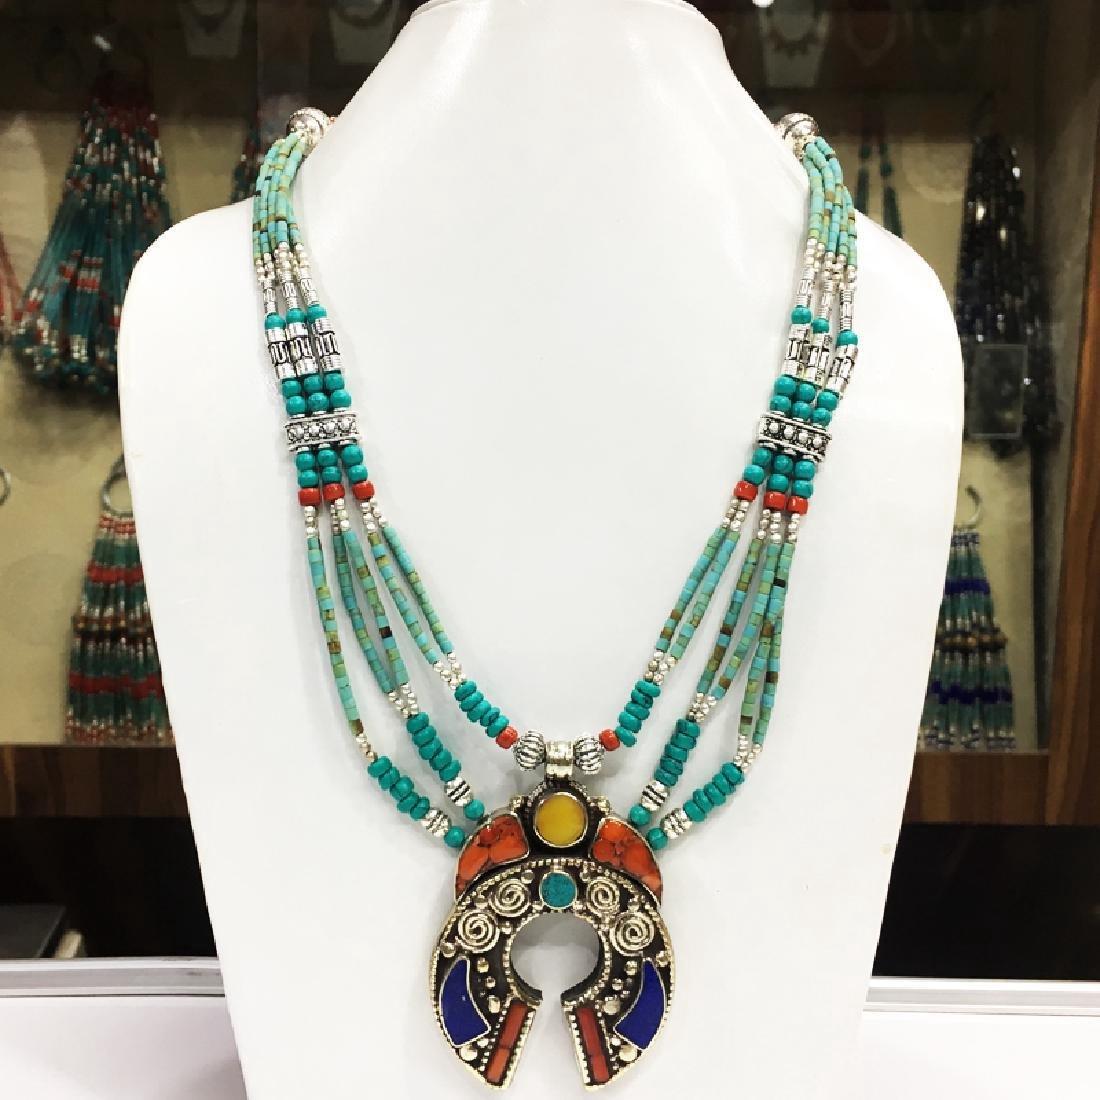 Tibetan Silver Handmade Turquise Coral Pendant Necklace